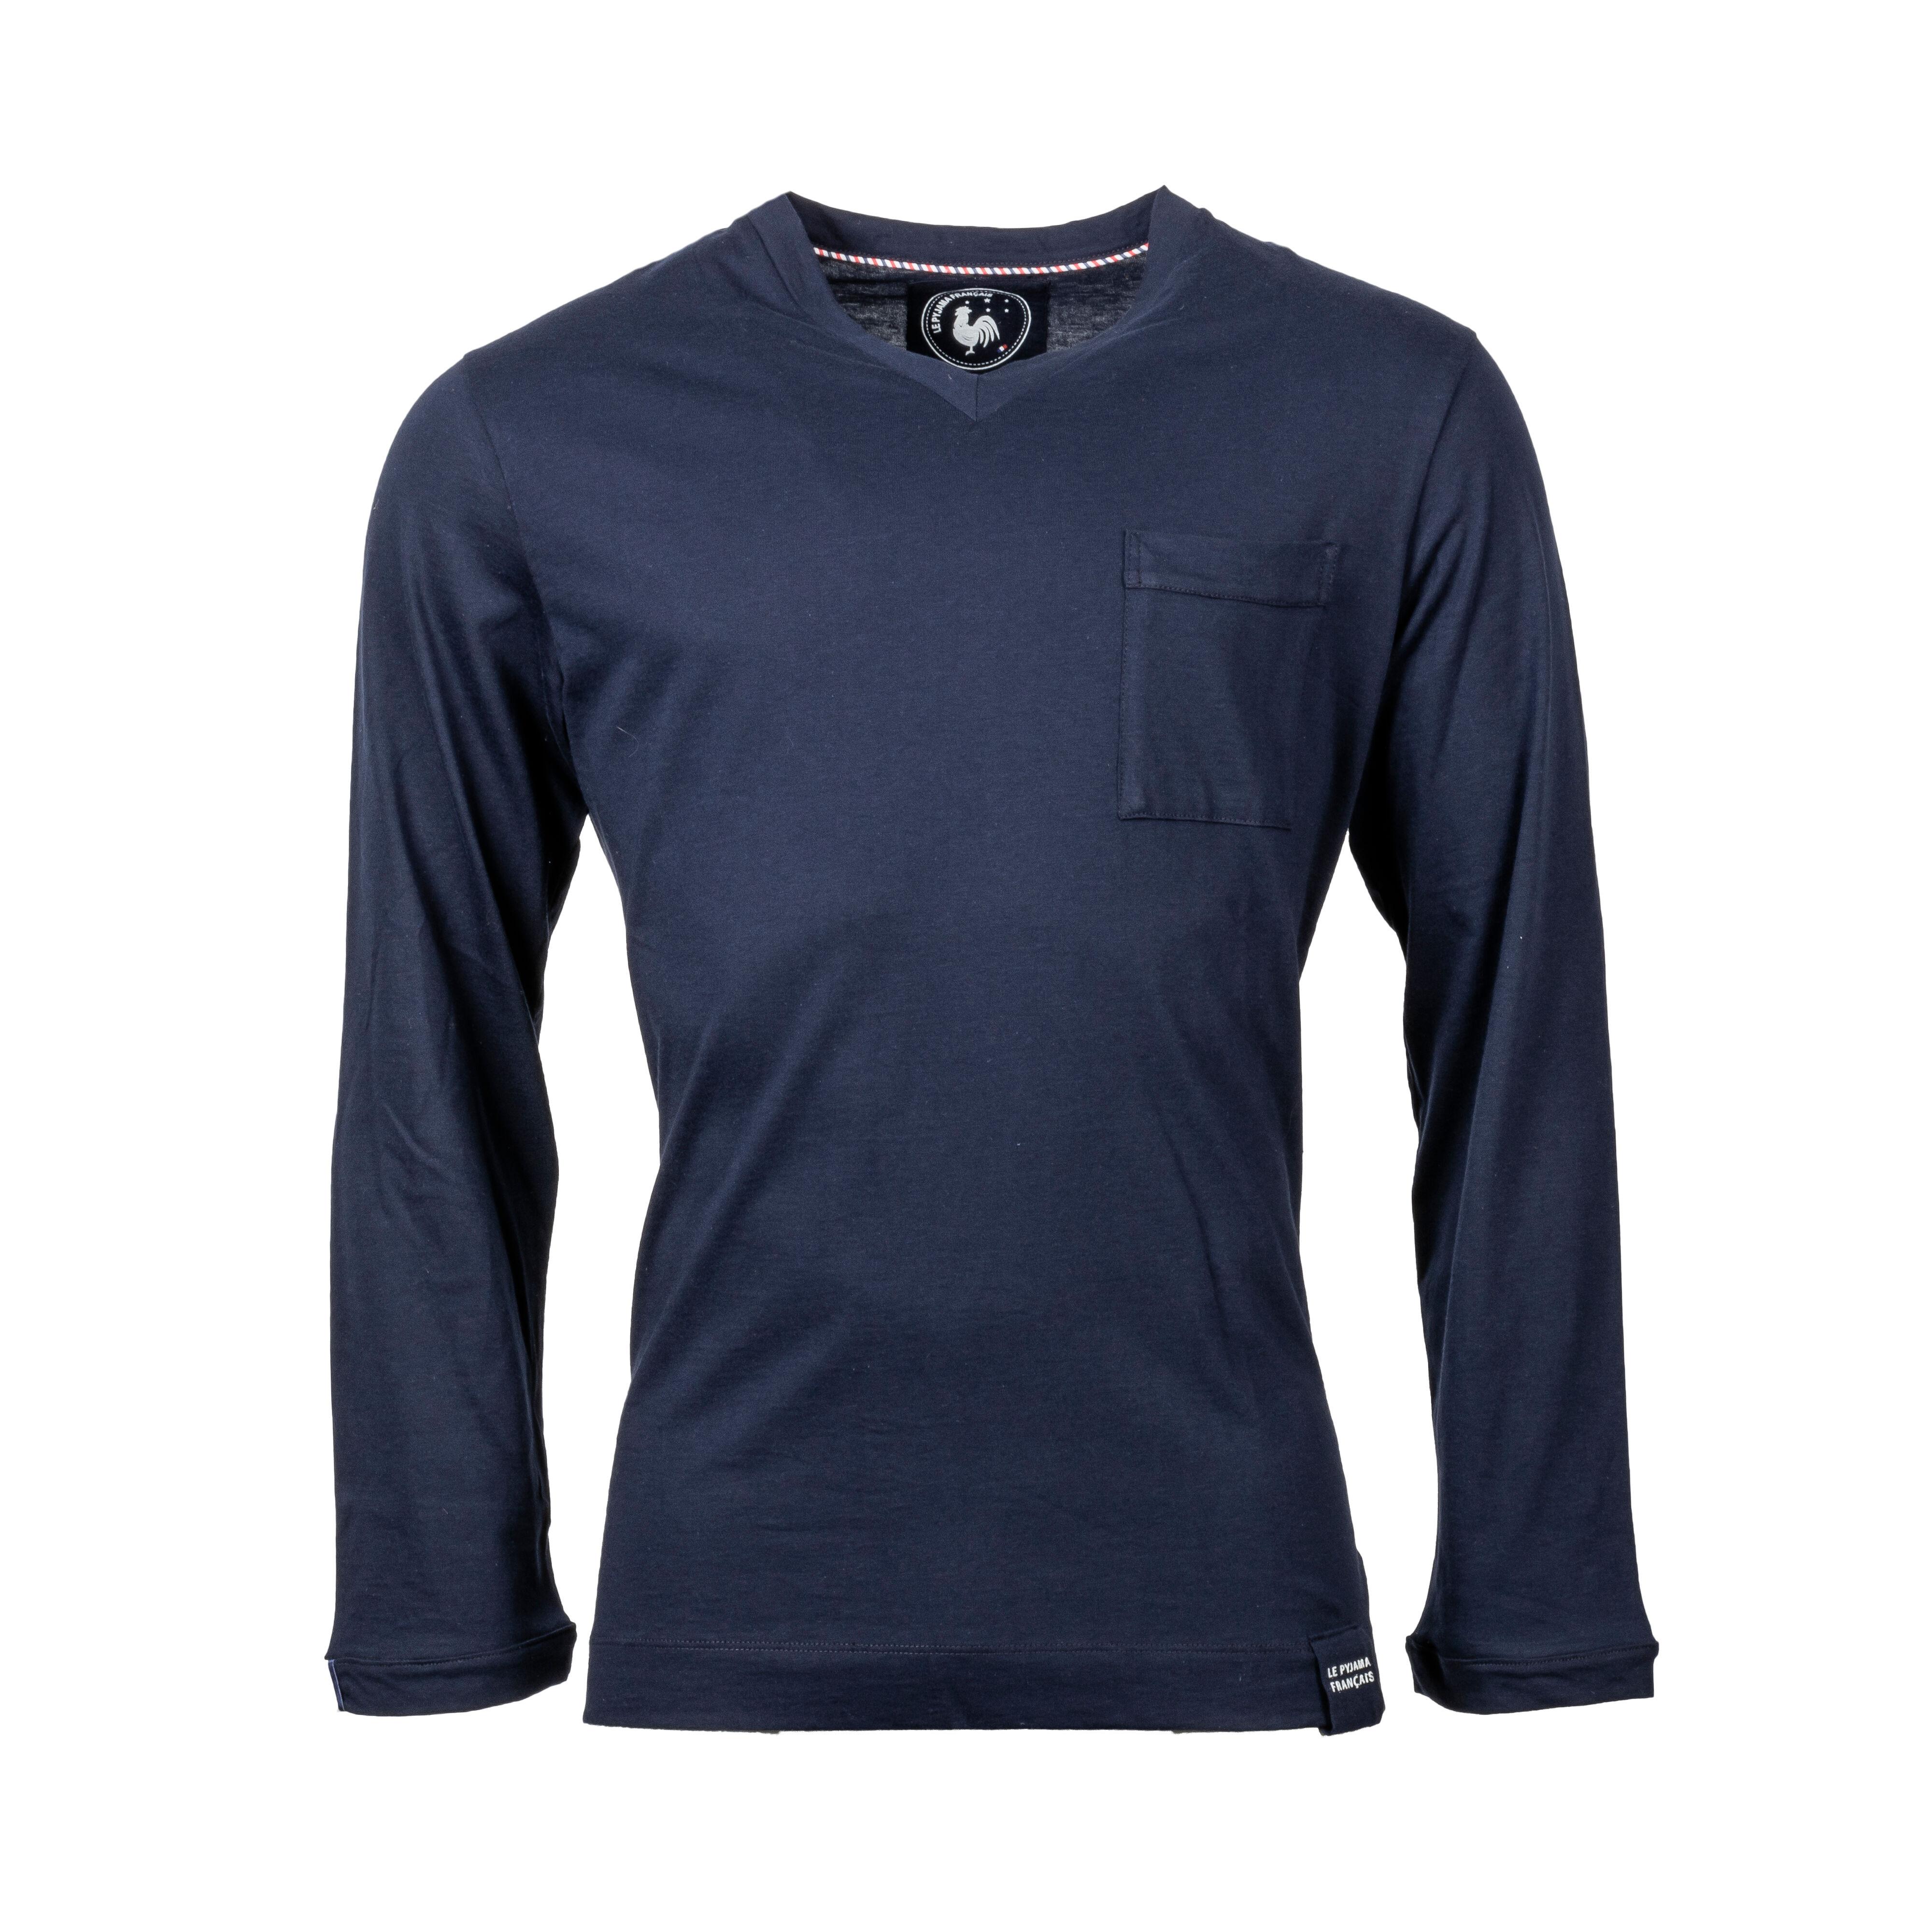 Le Pyjama Français Tee-shirt de pyjama manches longues Made in France Le Pyjama Français en coton bleu marine - BLEU - L